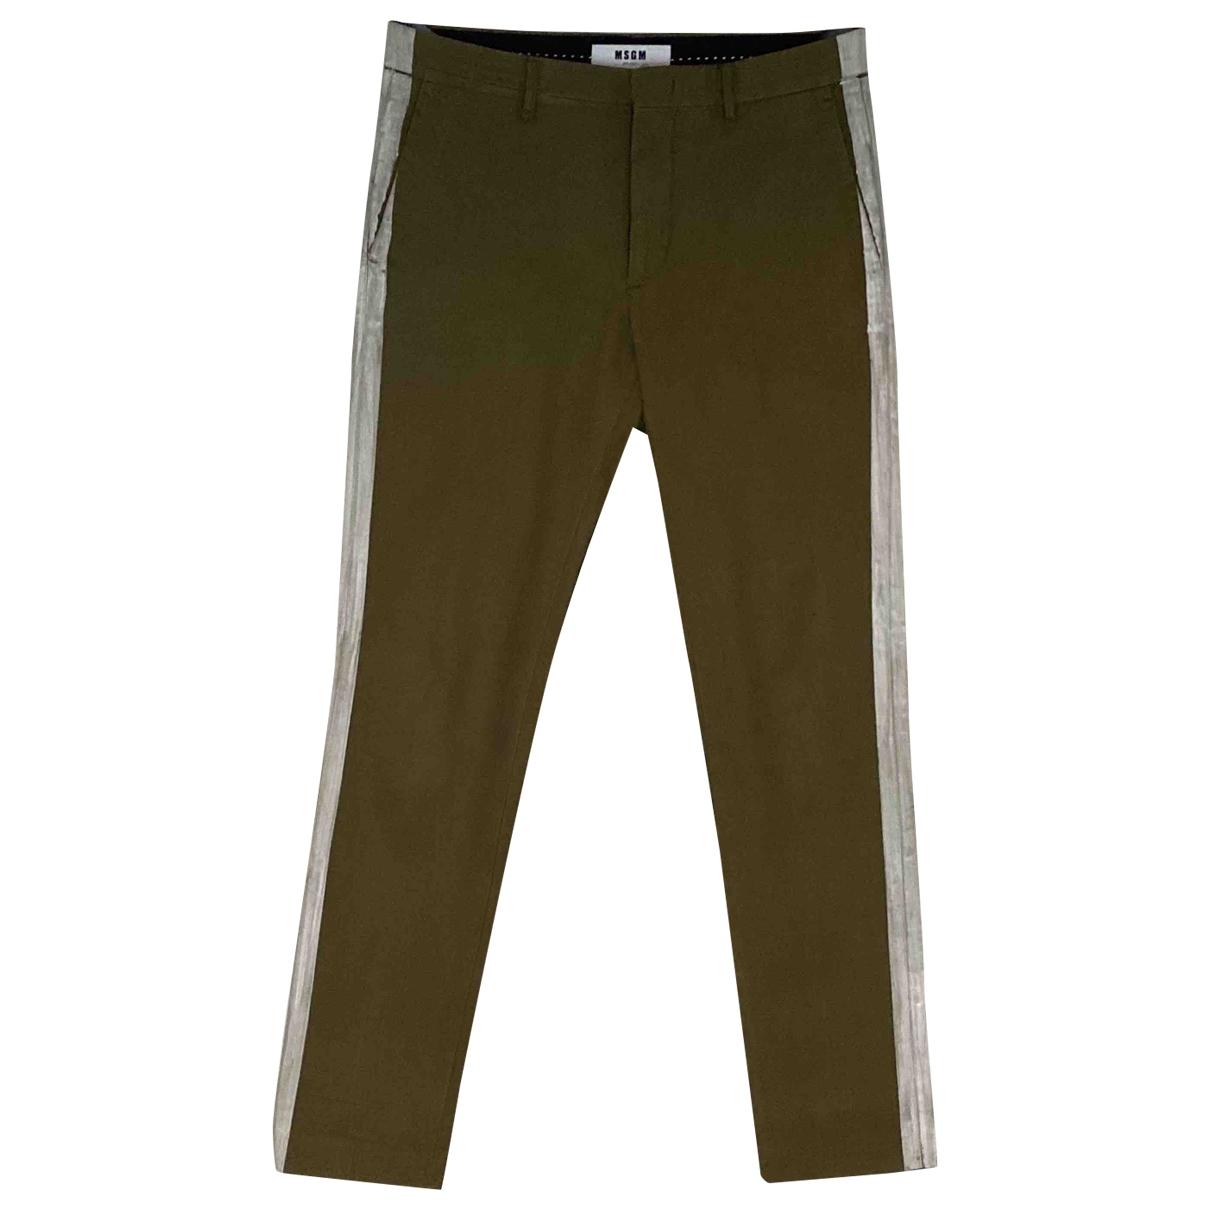 Msgm \N Khaki Cotton Trousers for Men 46 IT